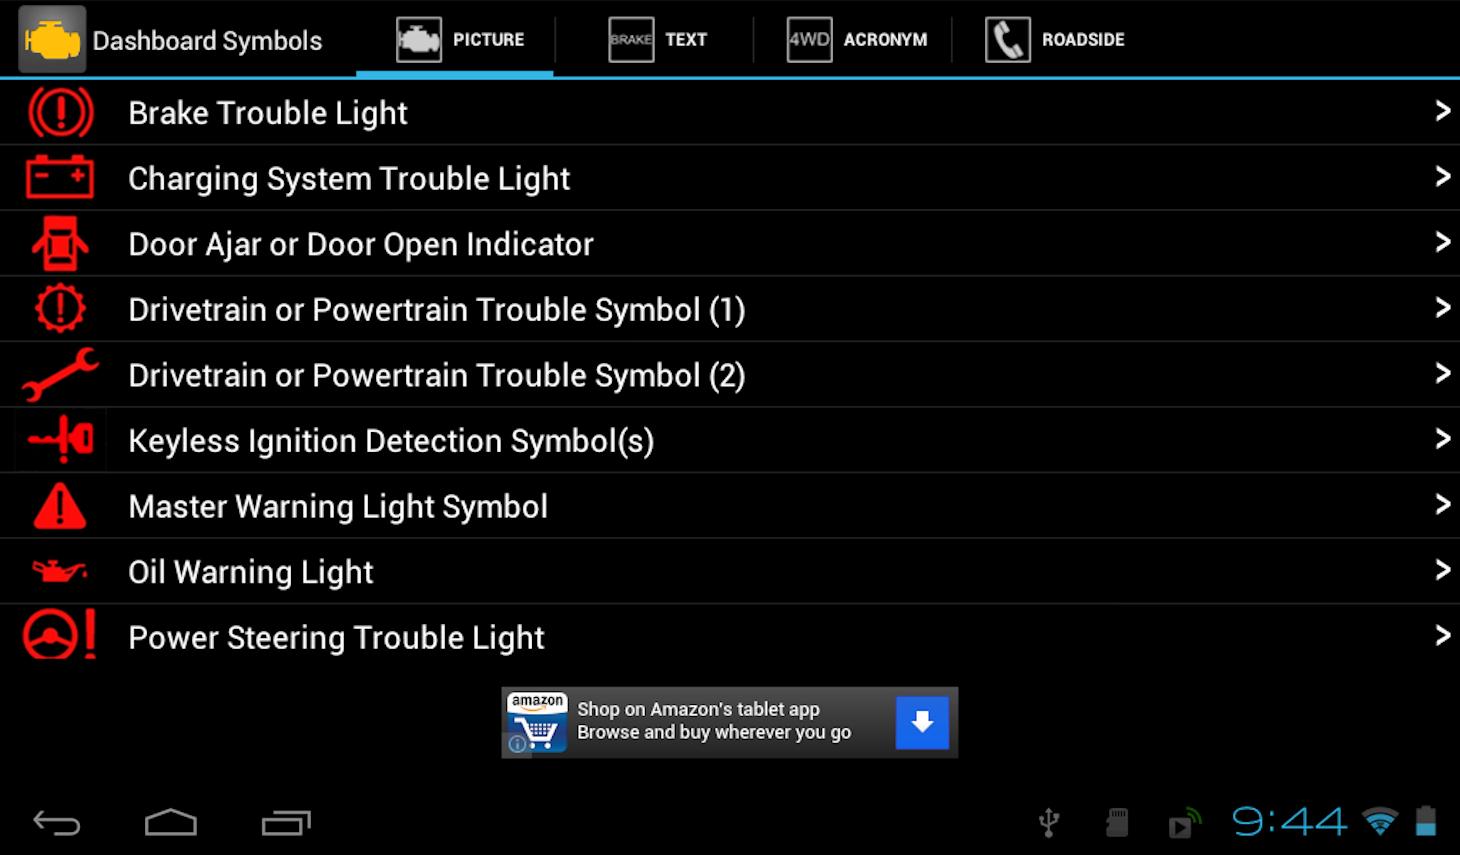 Car Lights Meaning Best Car - Car image sign of dashboarddashboard warningindicator light symbol quiz know what your